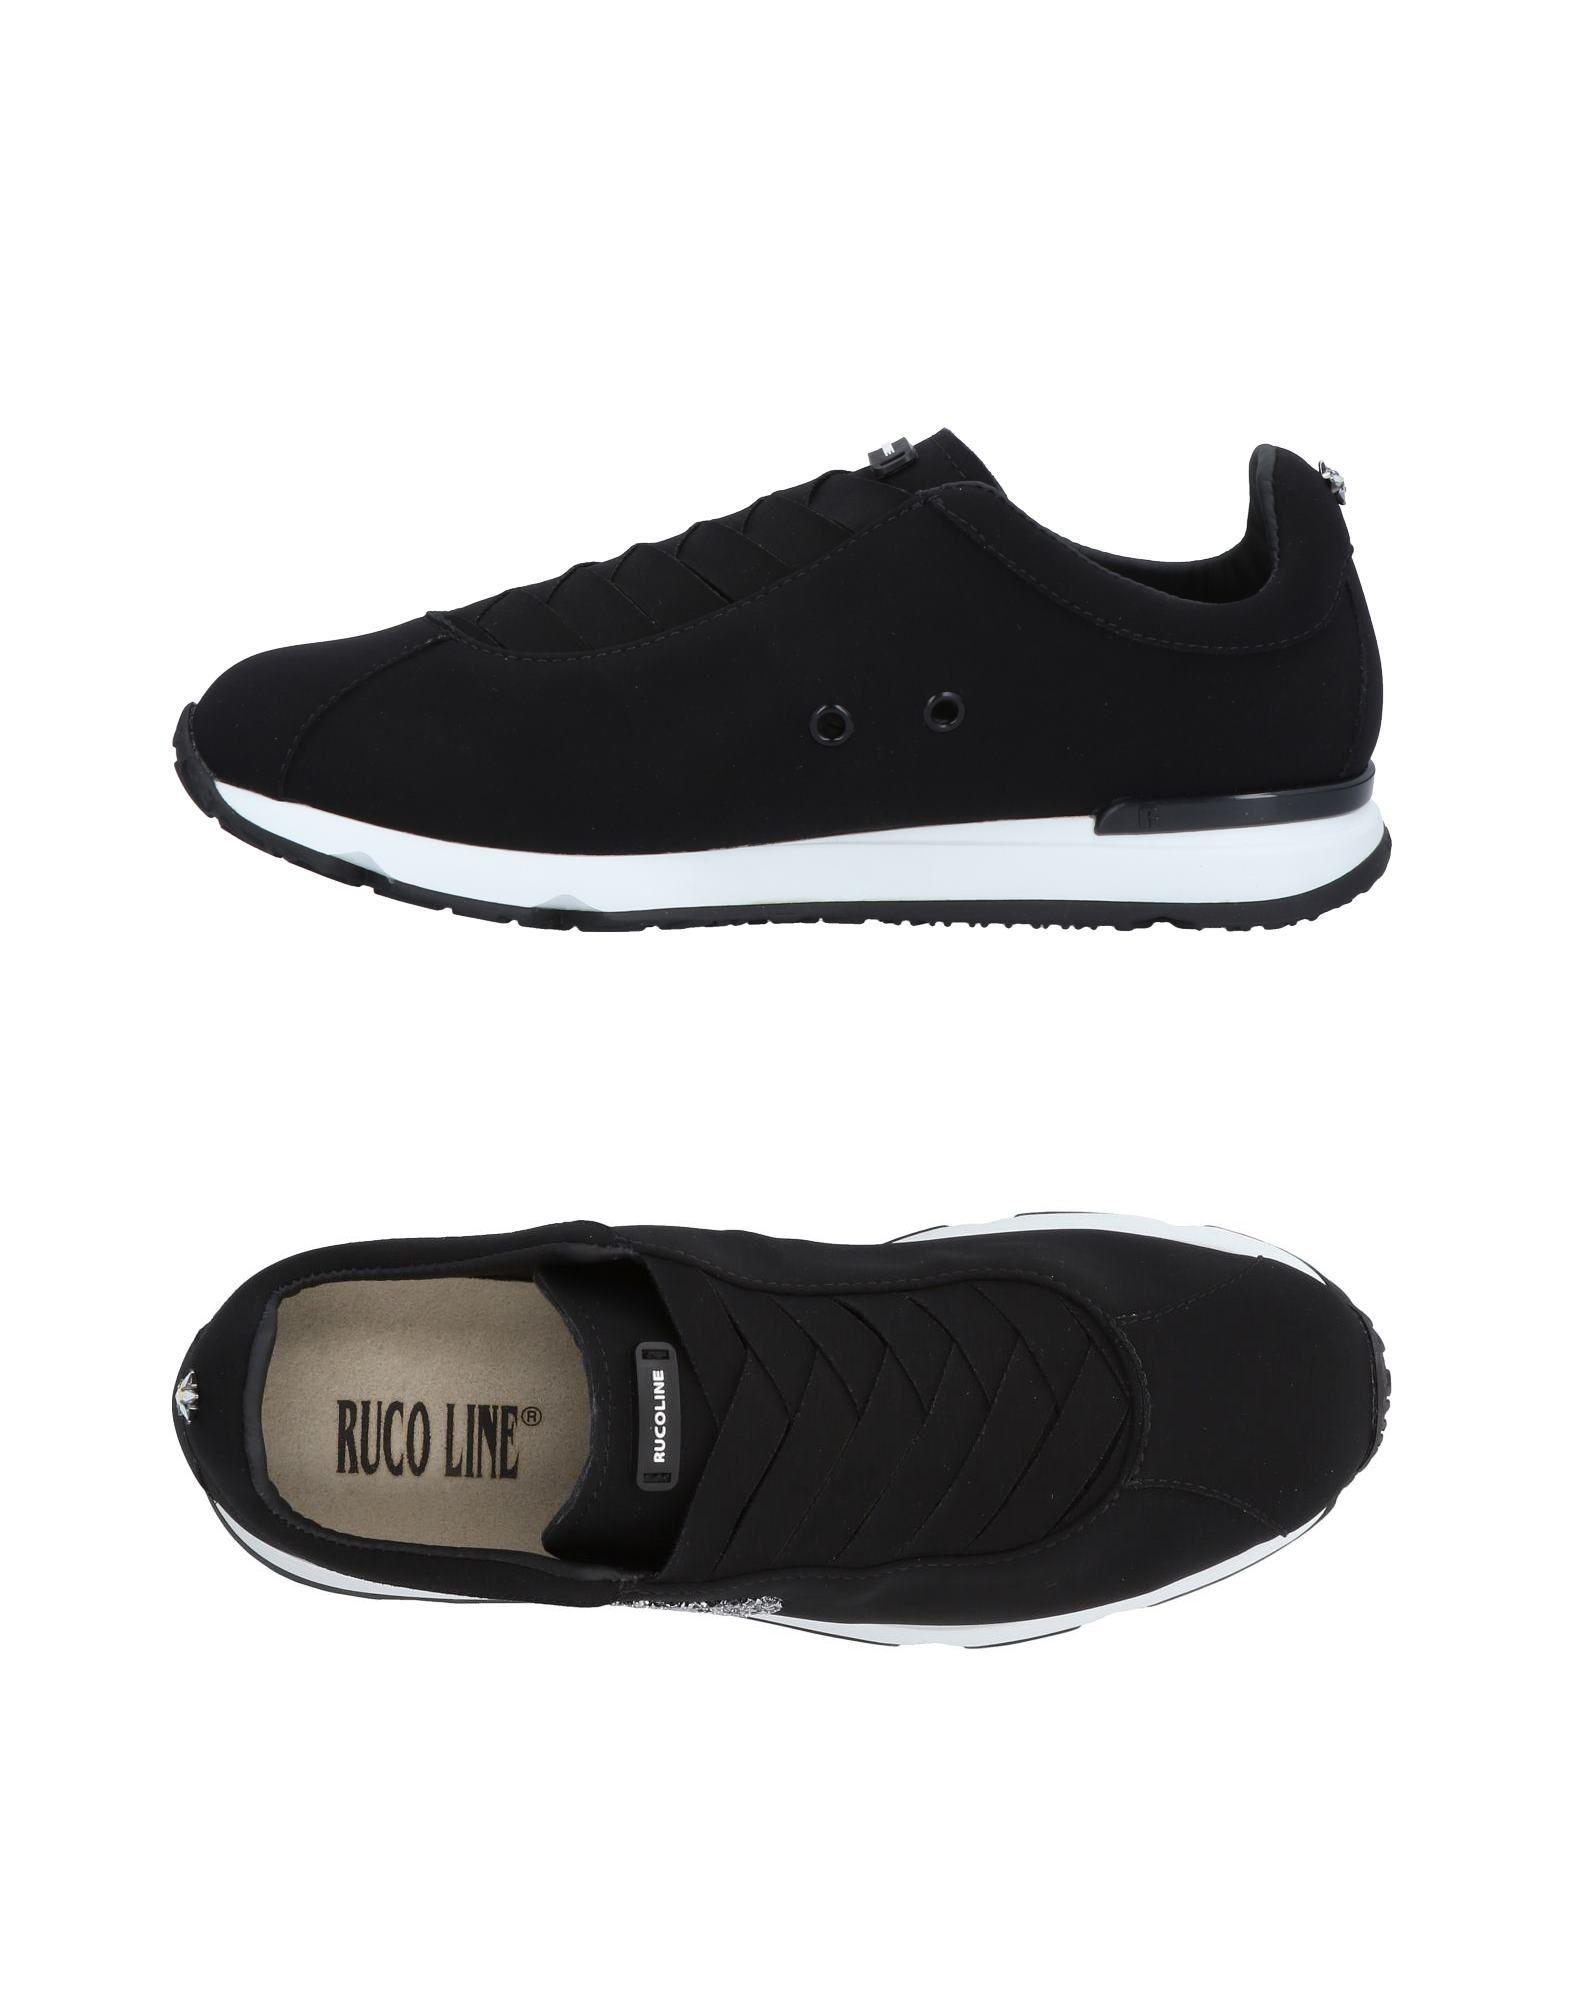 Ruco Line Sneakers - Women Ruco  Line Sneakers online on  Ruco Australia - 11495906IB 8ec3b8